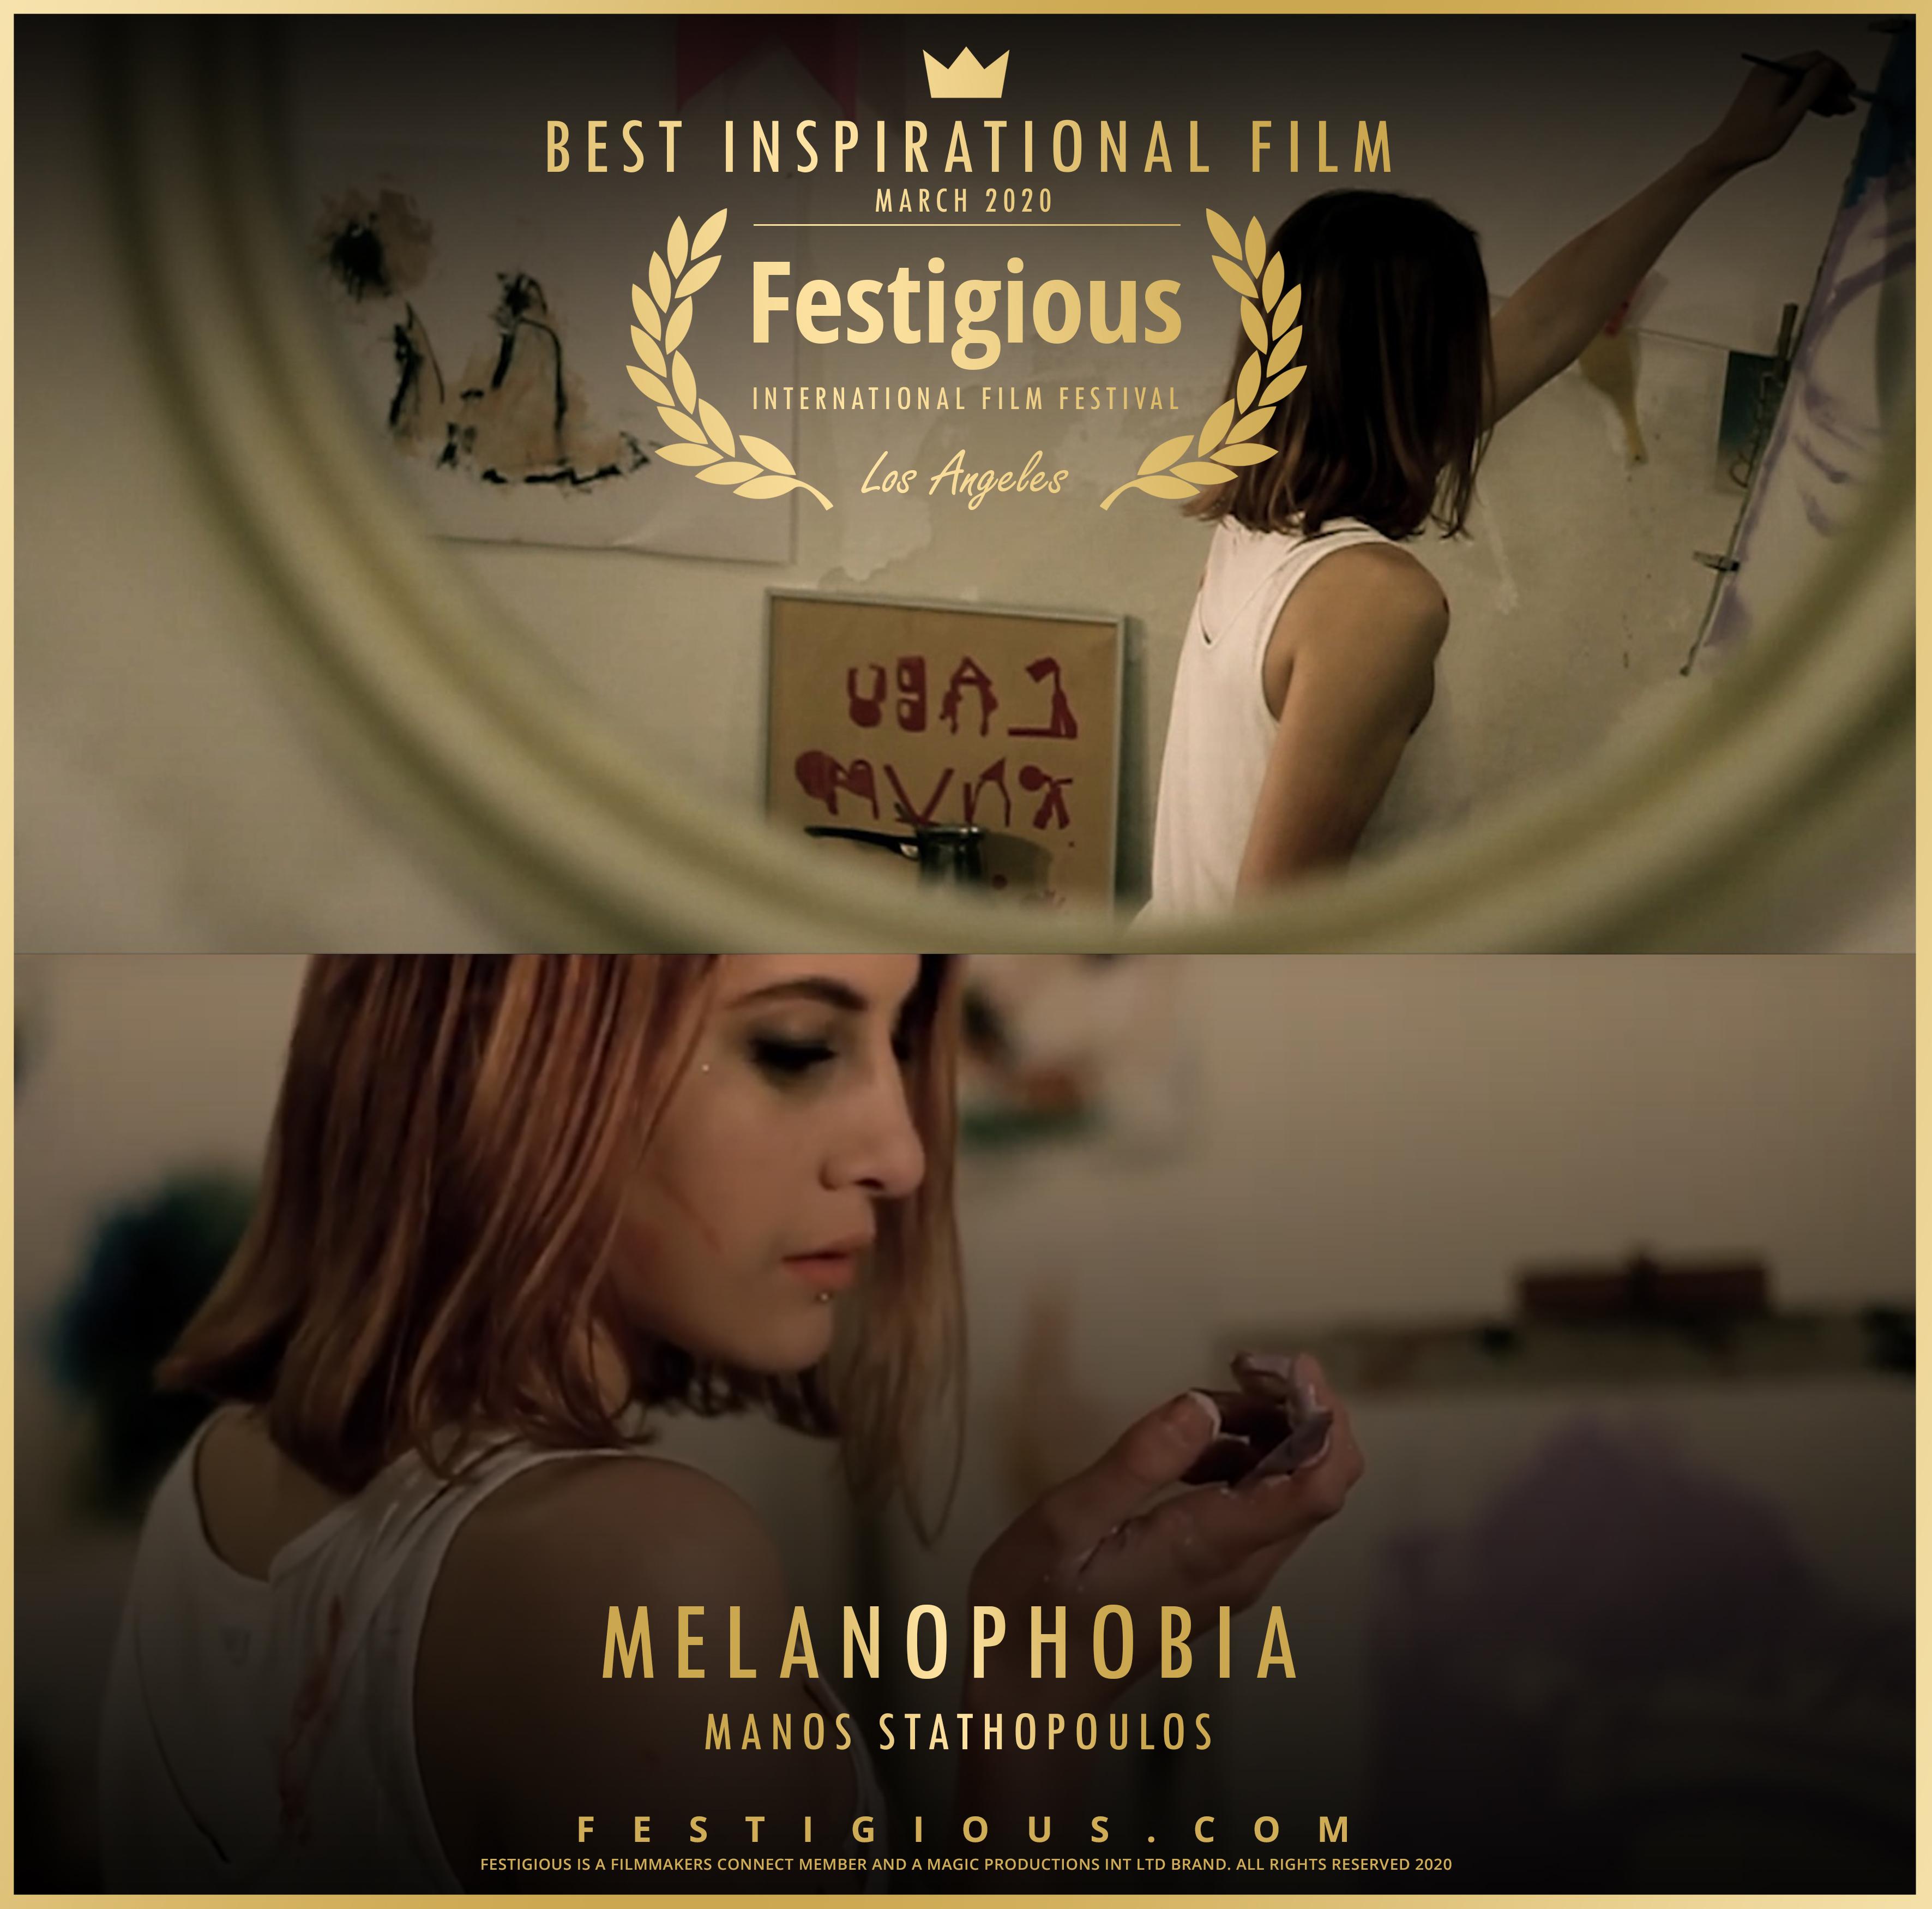 Melanophobia design